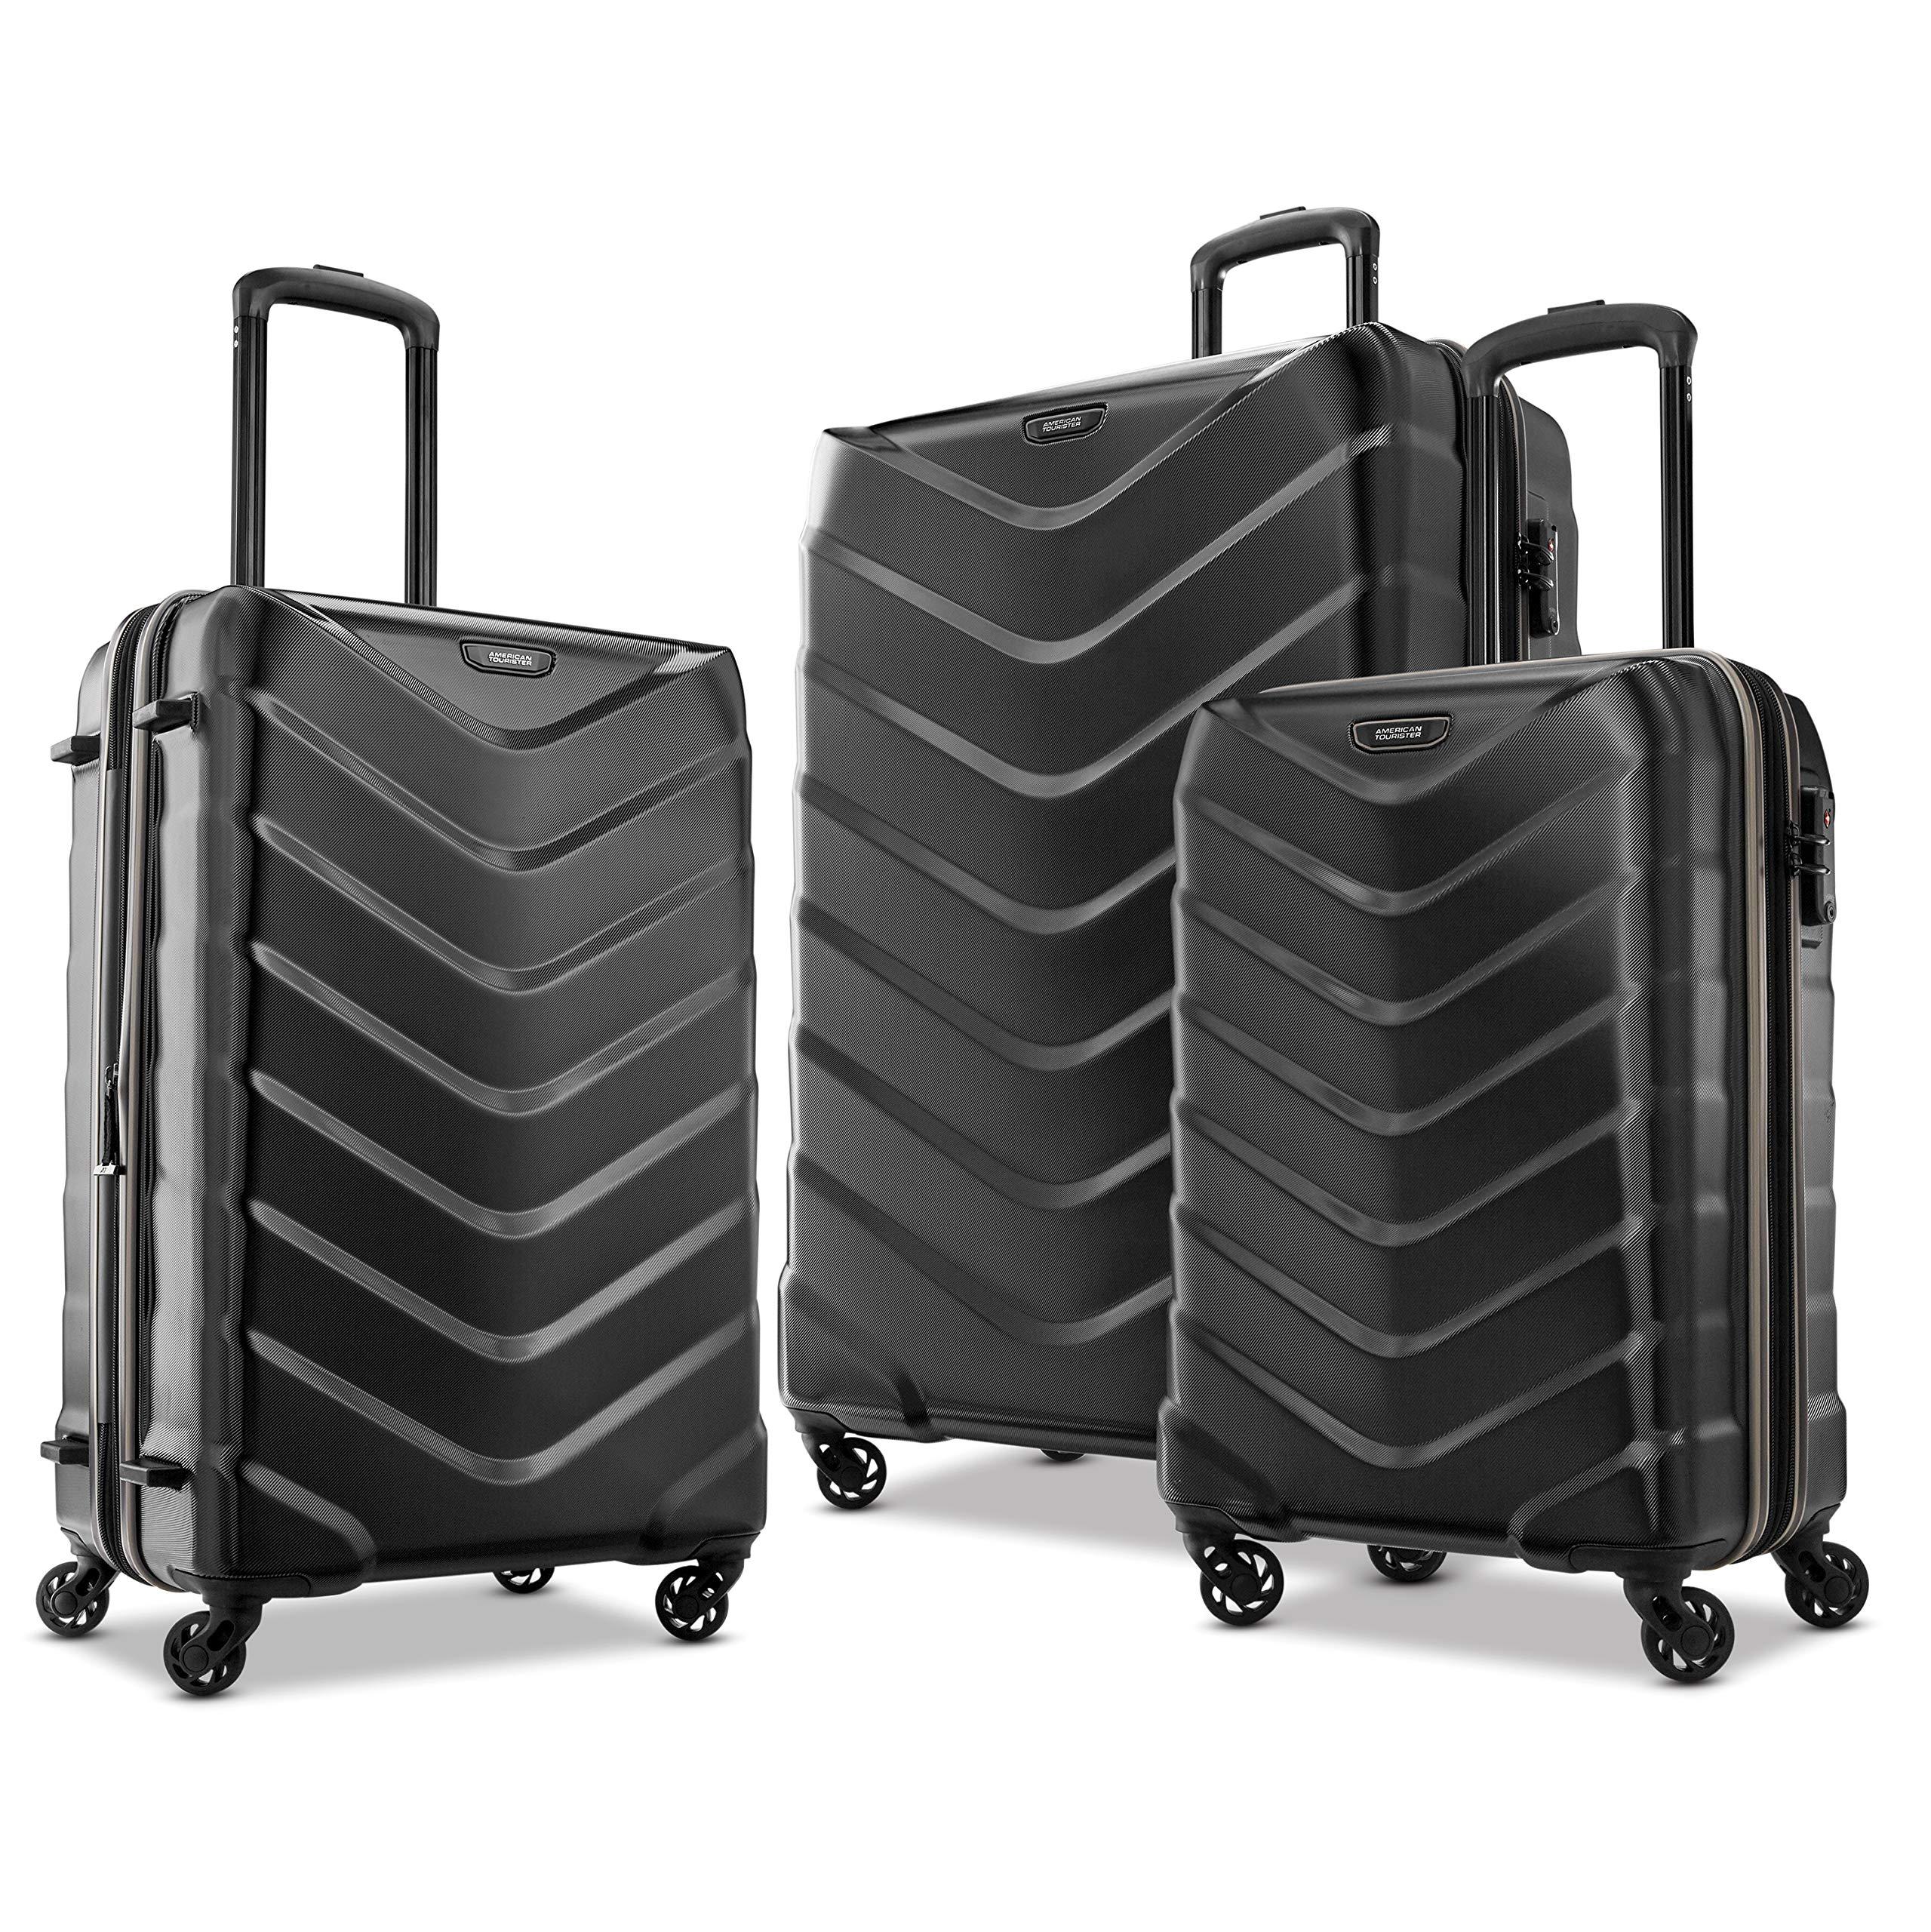 American Tourister Expandable Hardside Luggage